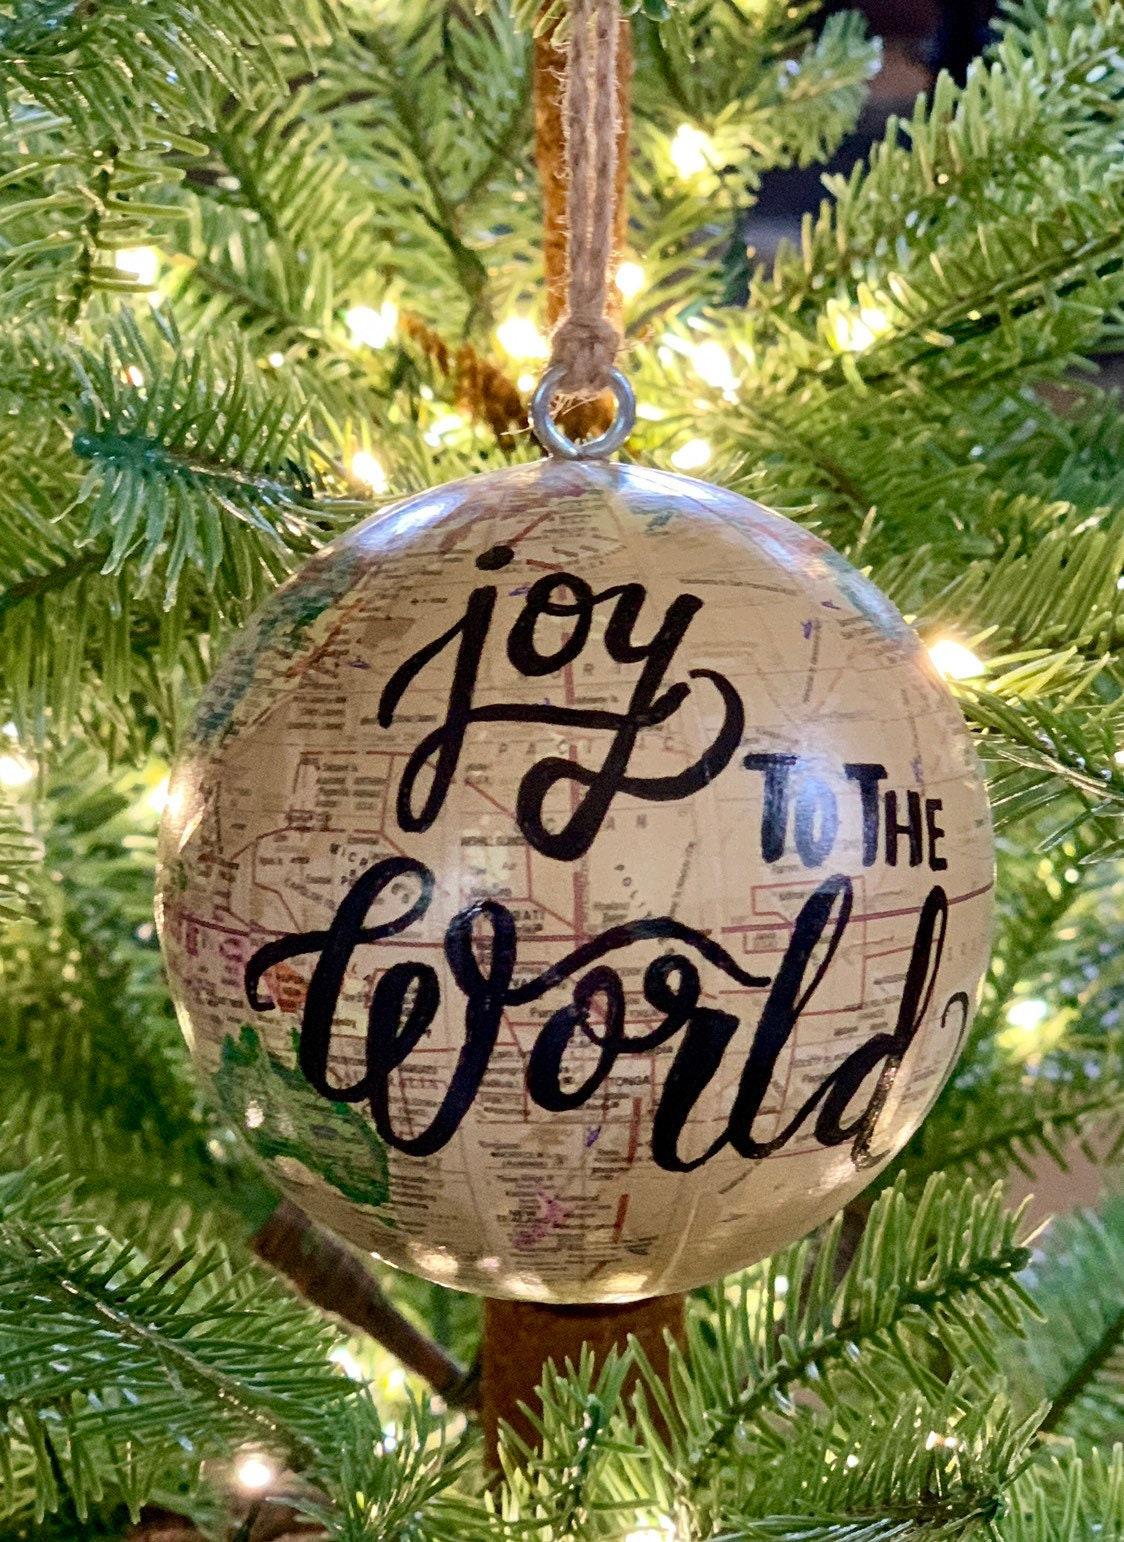 World globe Christmas Ornament - Customized w/names/saying - Perfect for Christmas gift giving ...